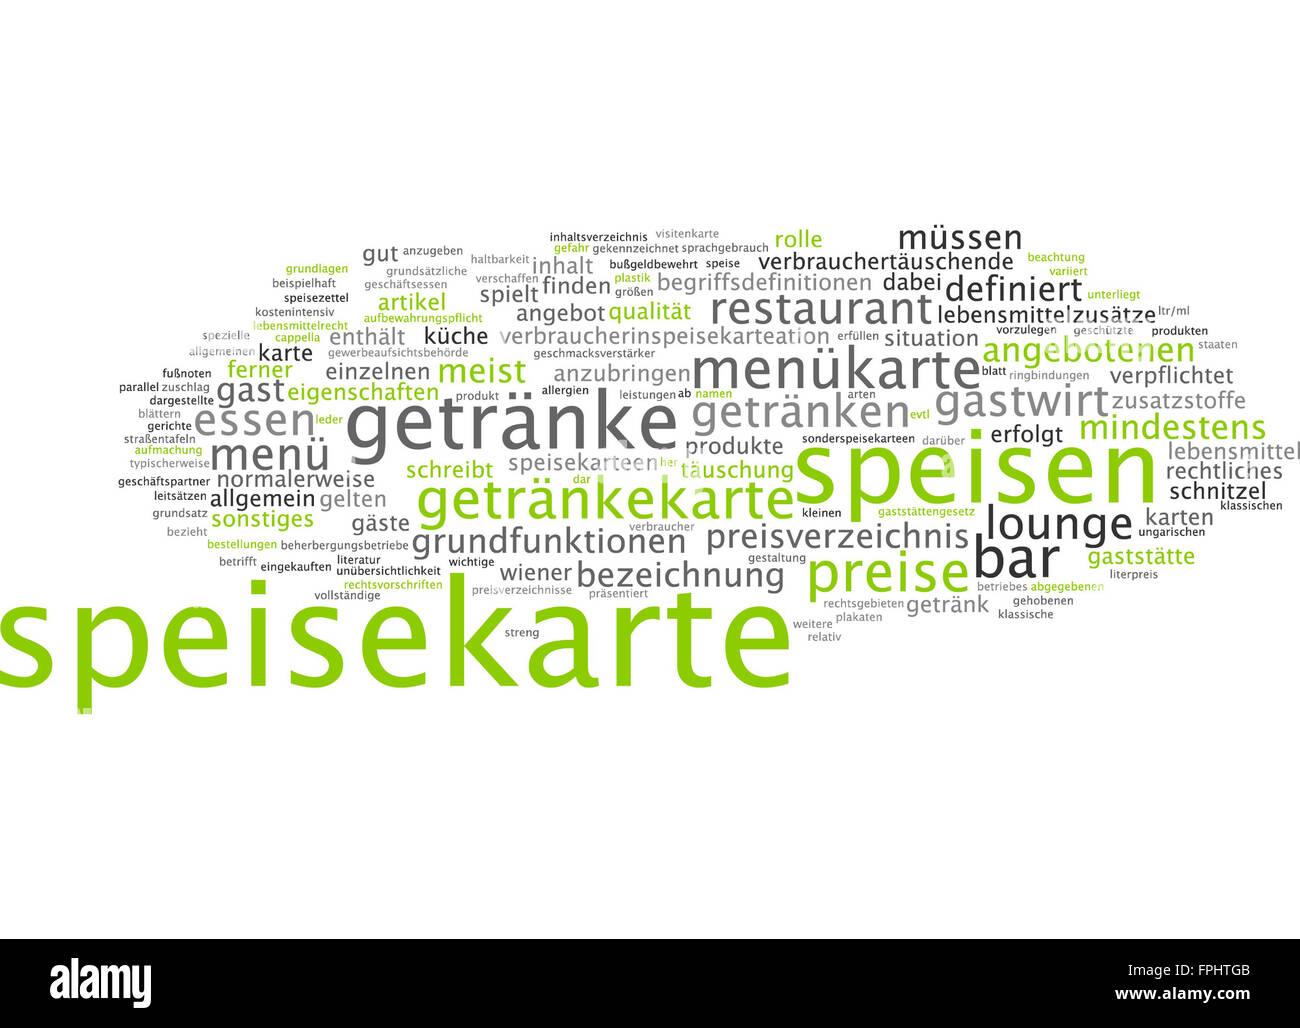 Speisekarte Menükarte Getränkekarte Karte Speisen - Stock Image